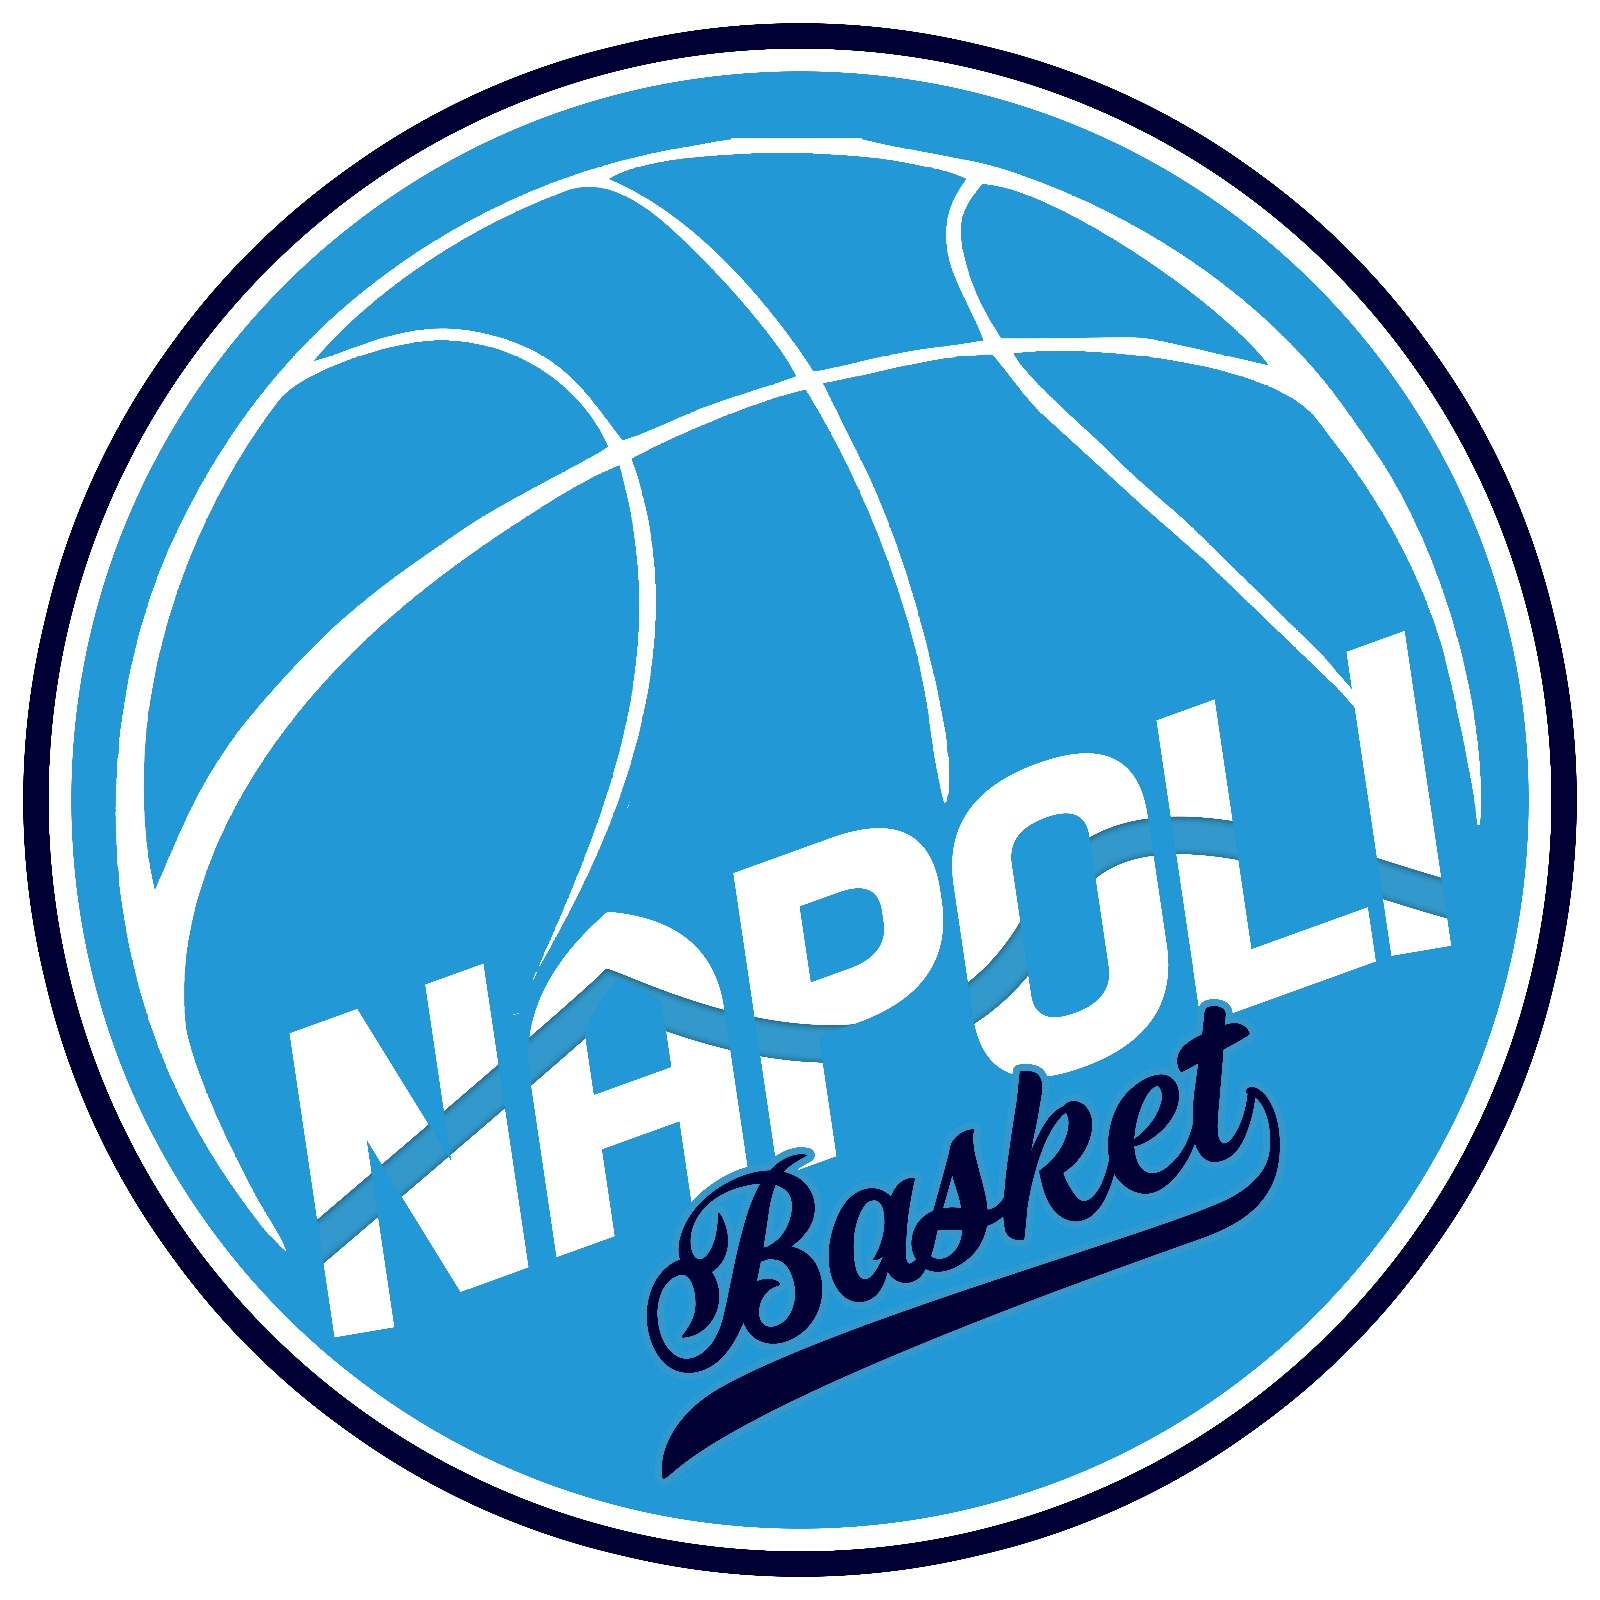 Napoli BasketScuola Basket Napoli - Napoli Basket